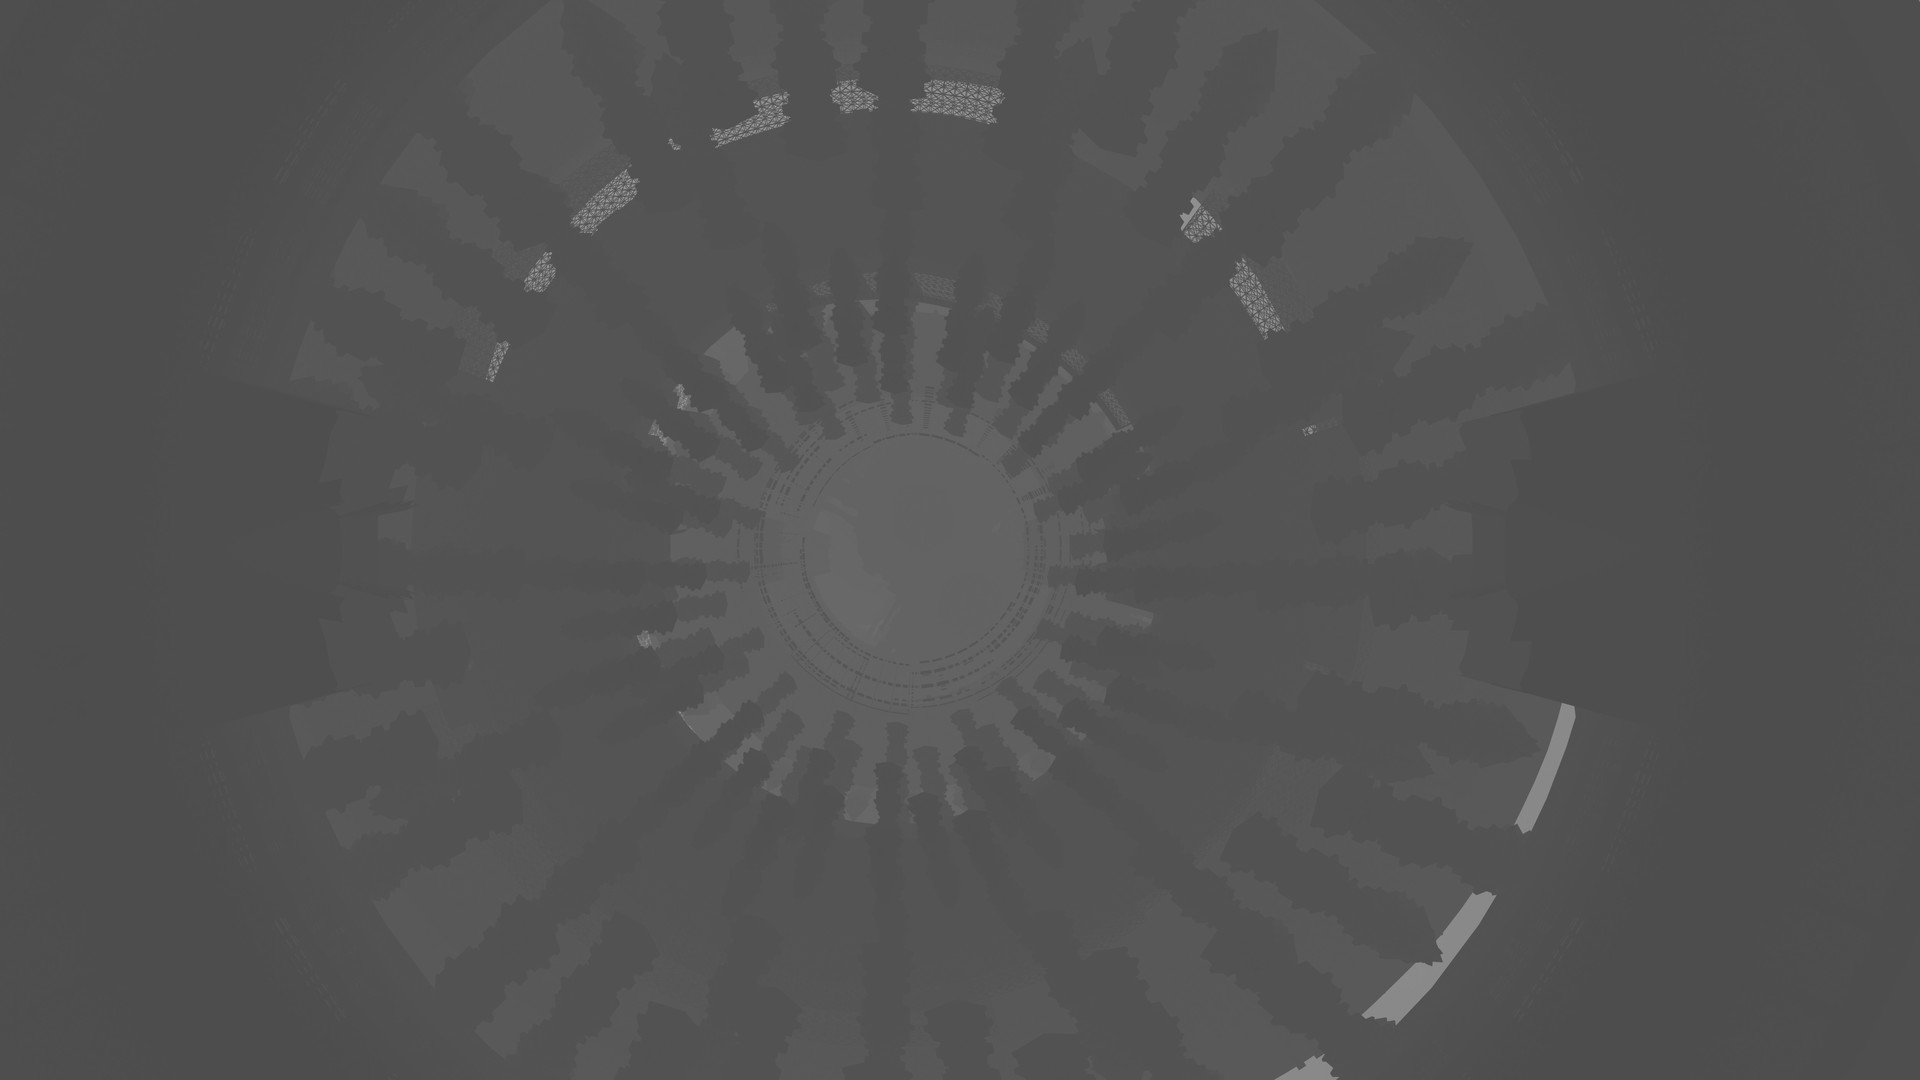 Kresimir jelusic robob3ar 261 300616 rotator z